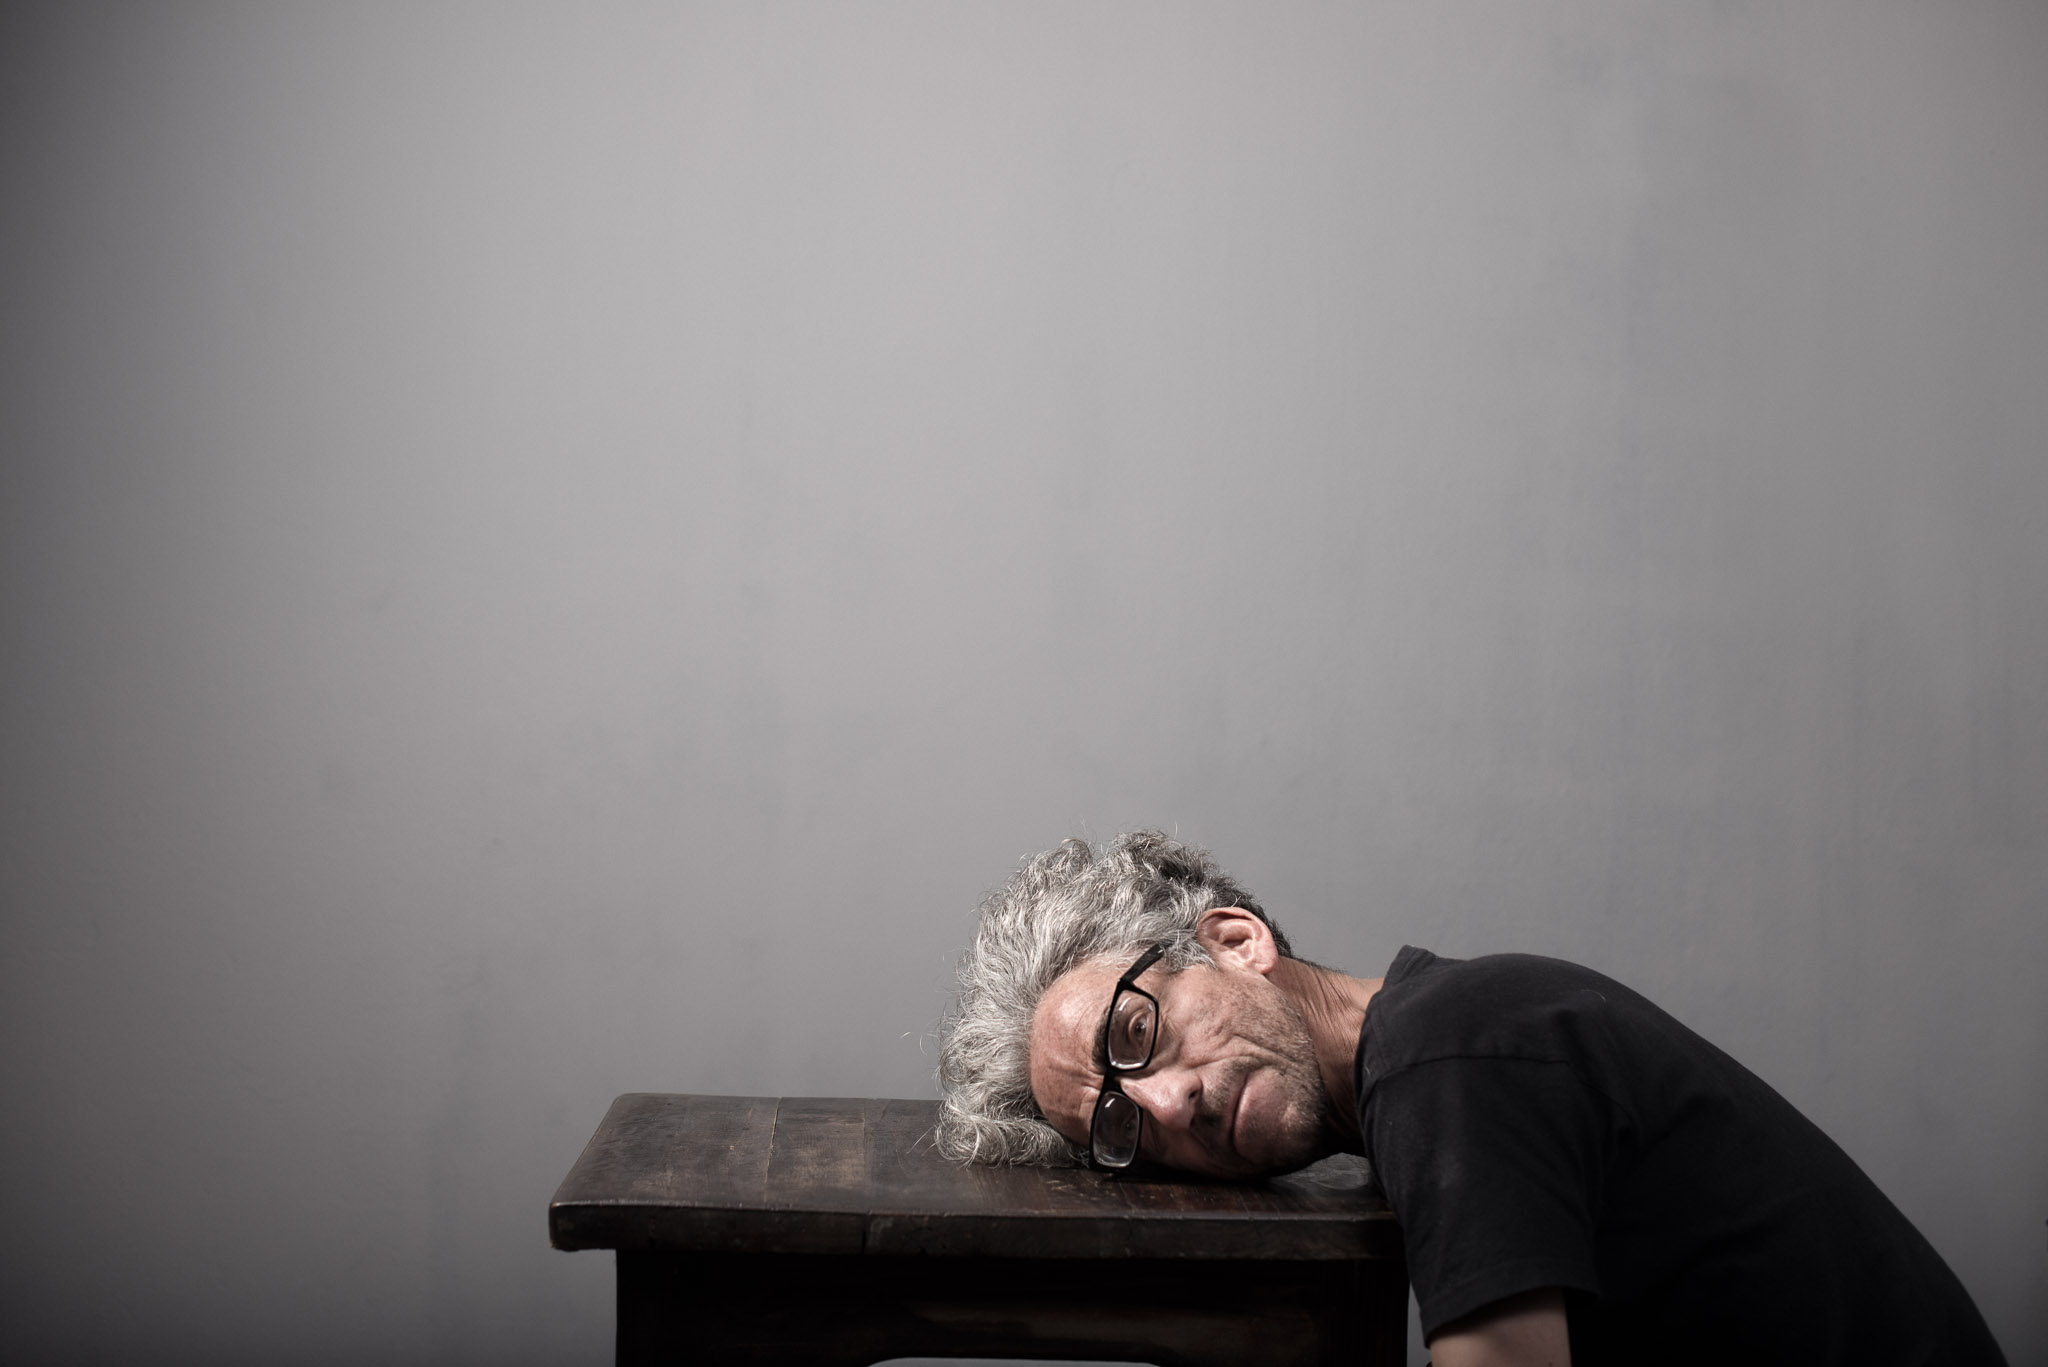 Antonio Caro